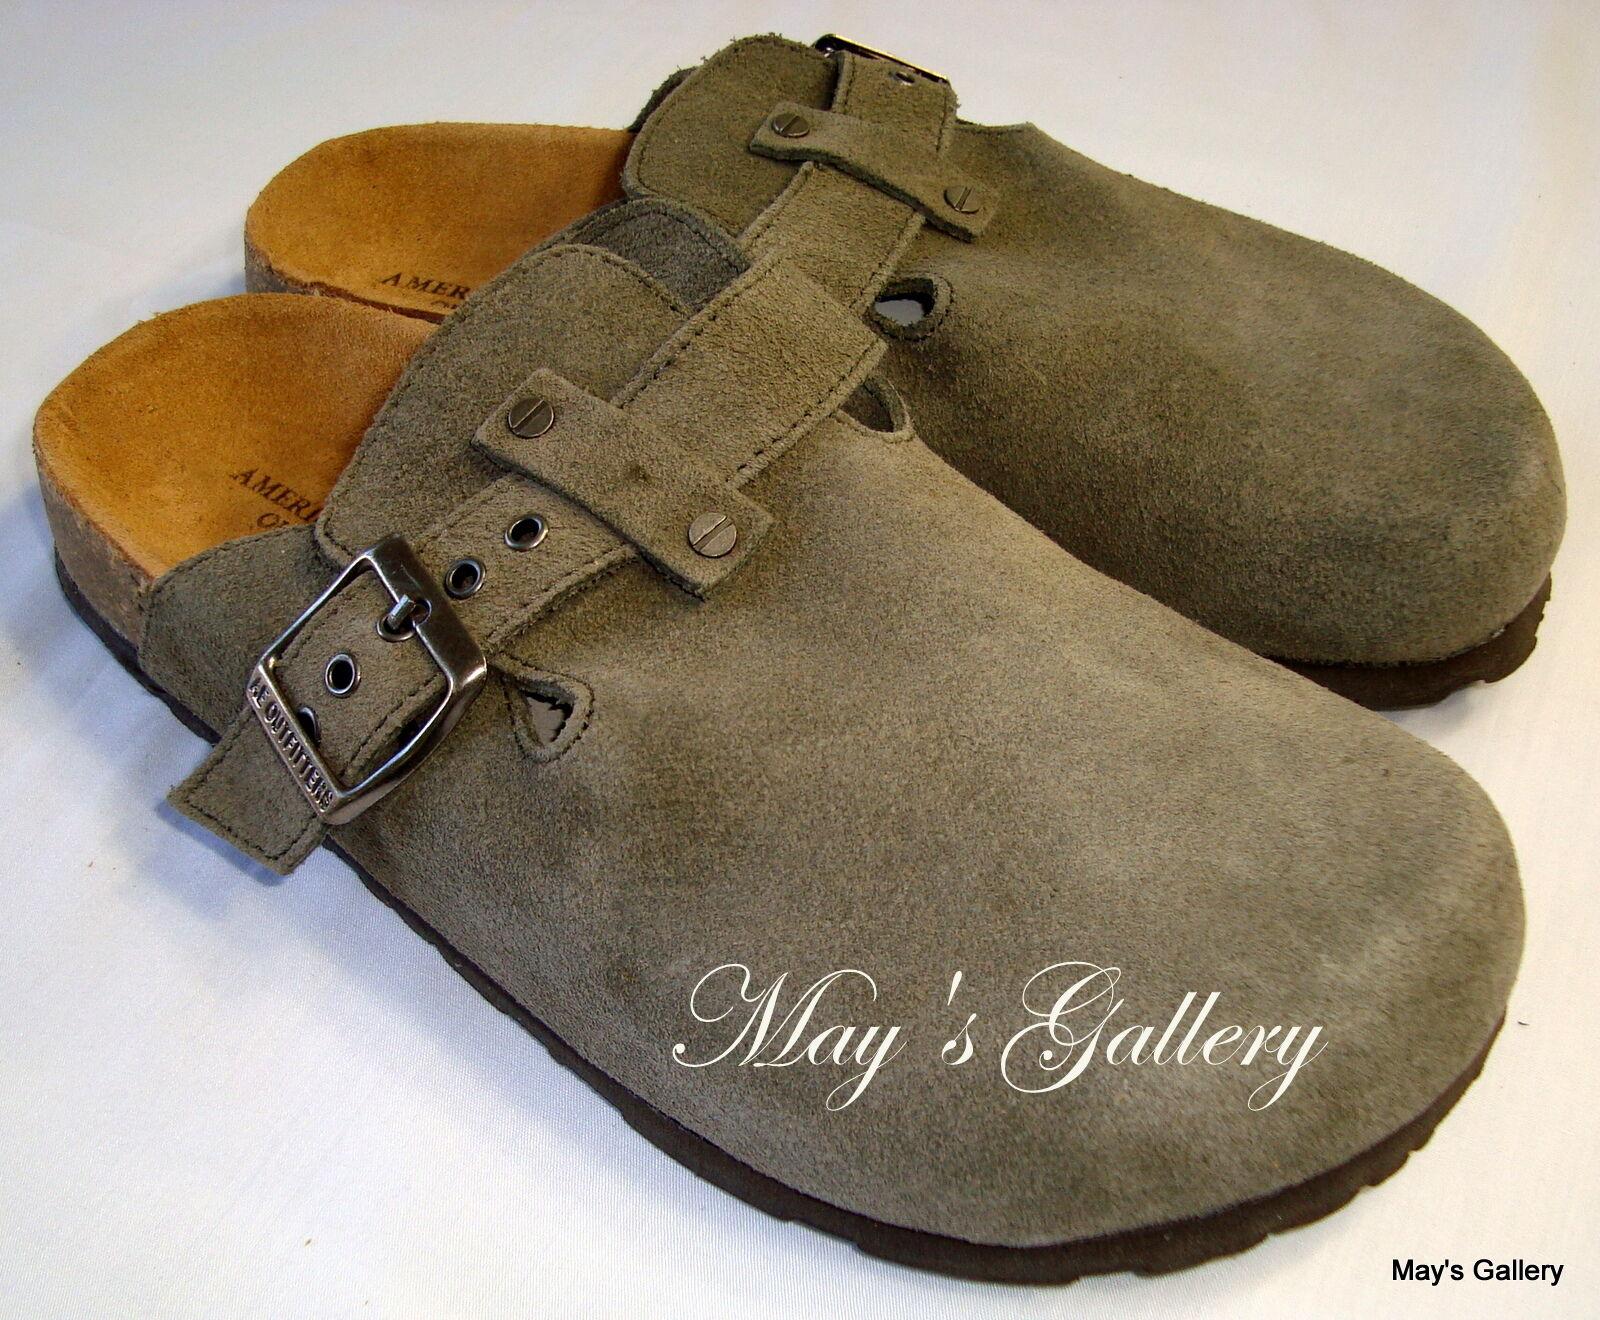 American Eagle AE Sandal Flip Flop Flops shoes Clogs Slipper Suede  shoes  AEO 6